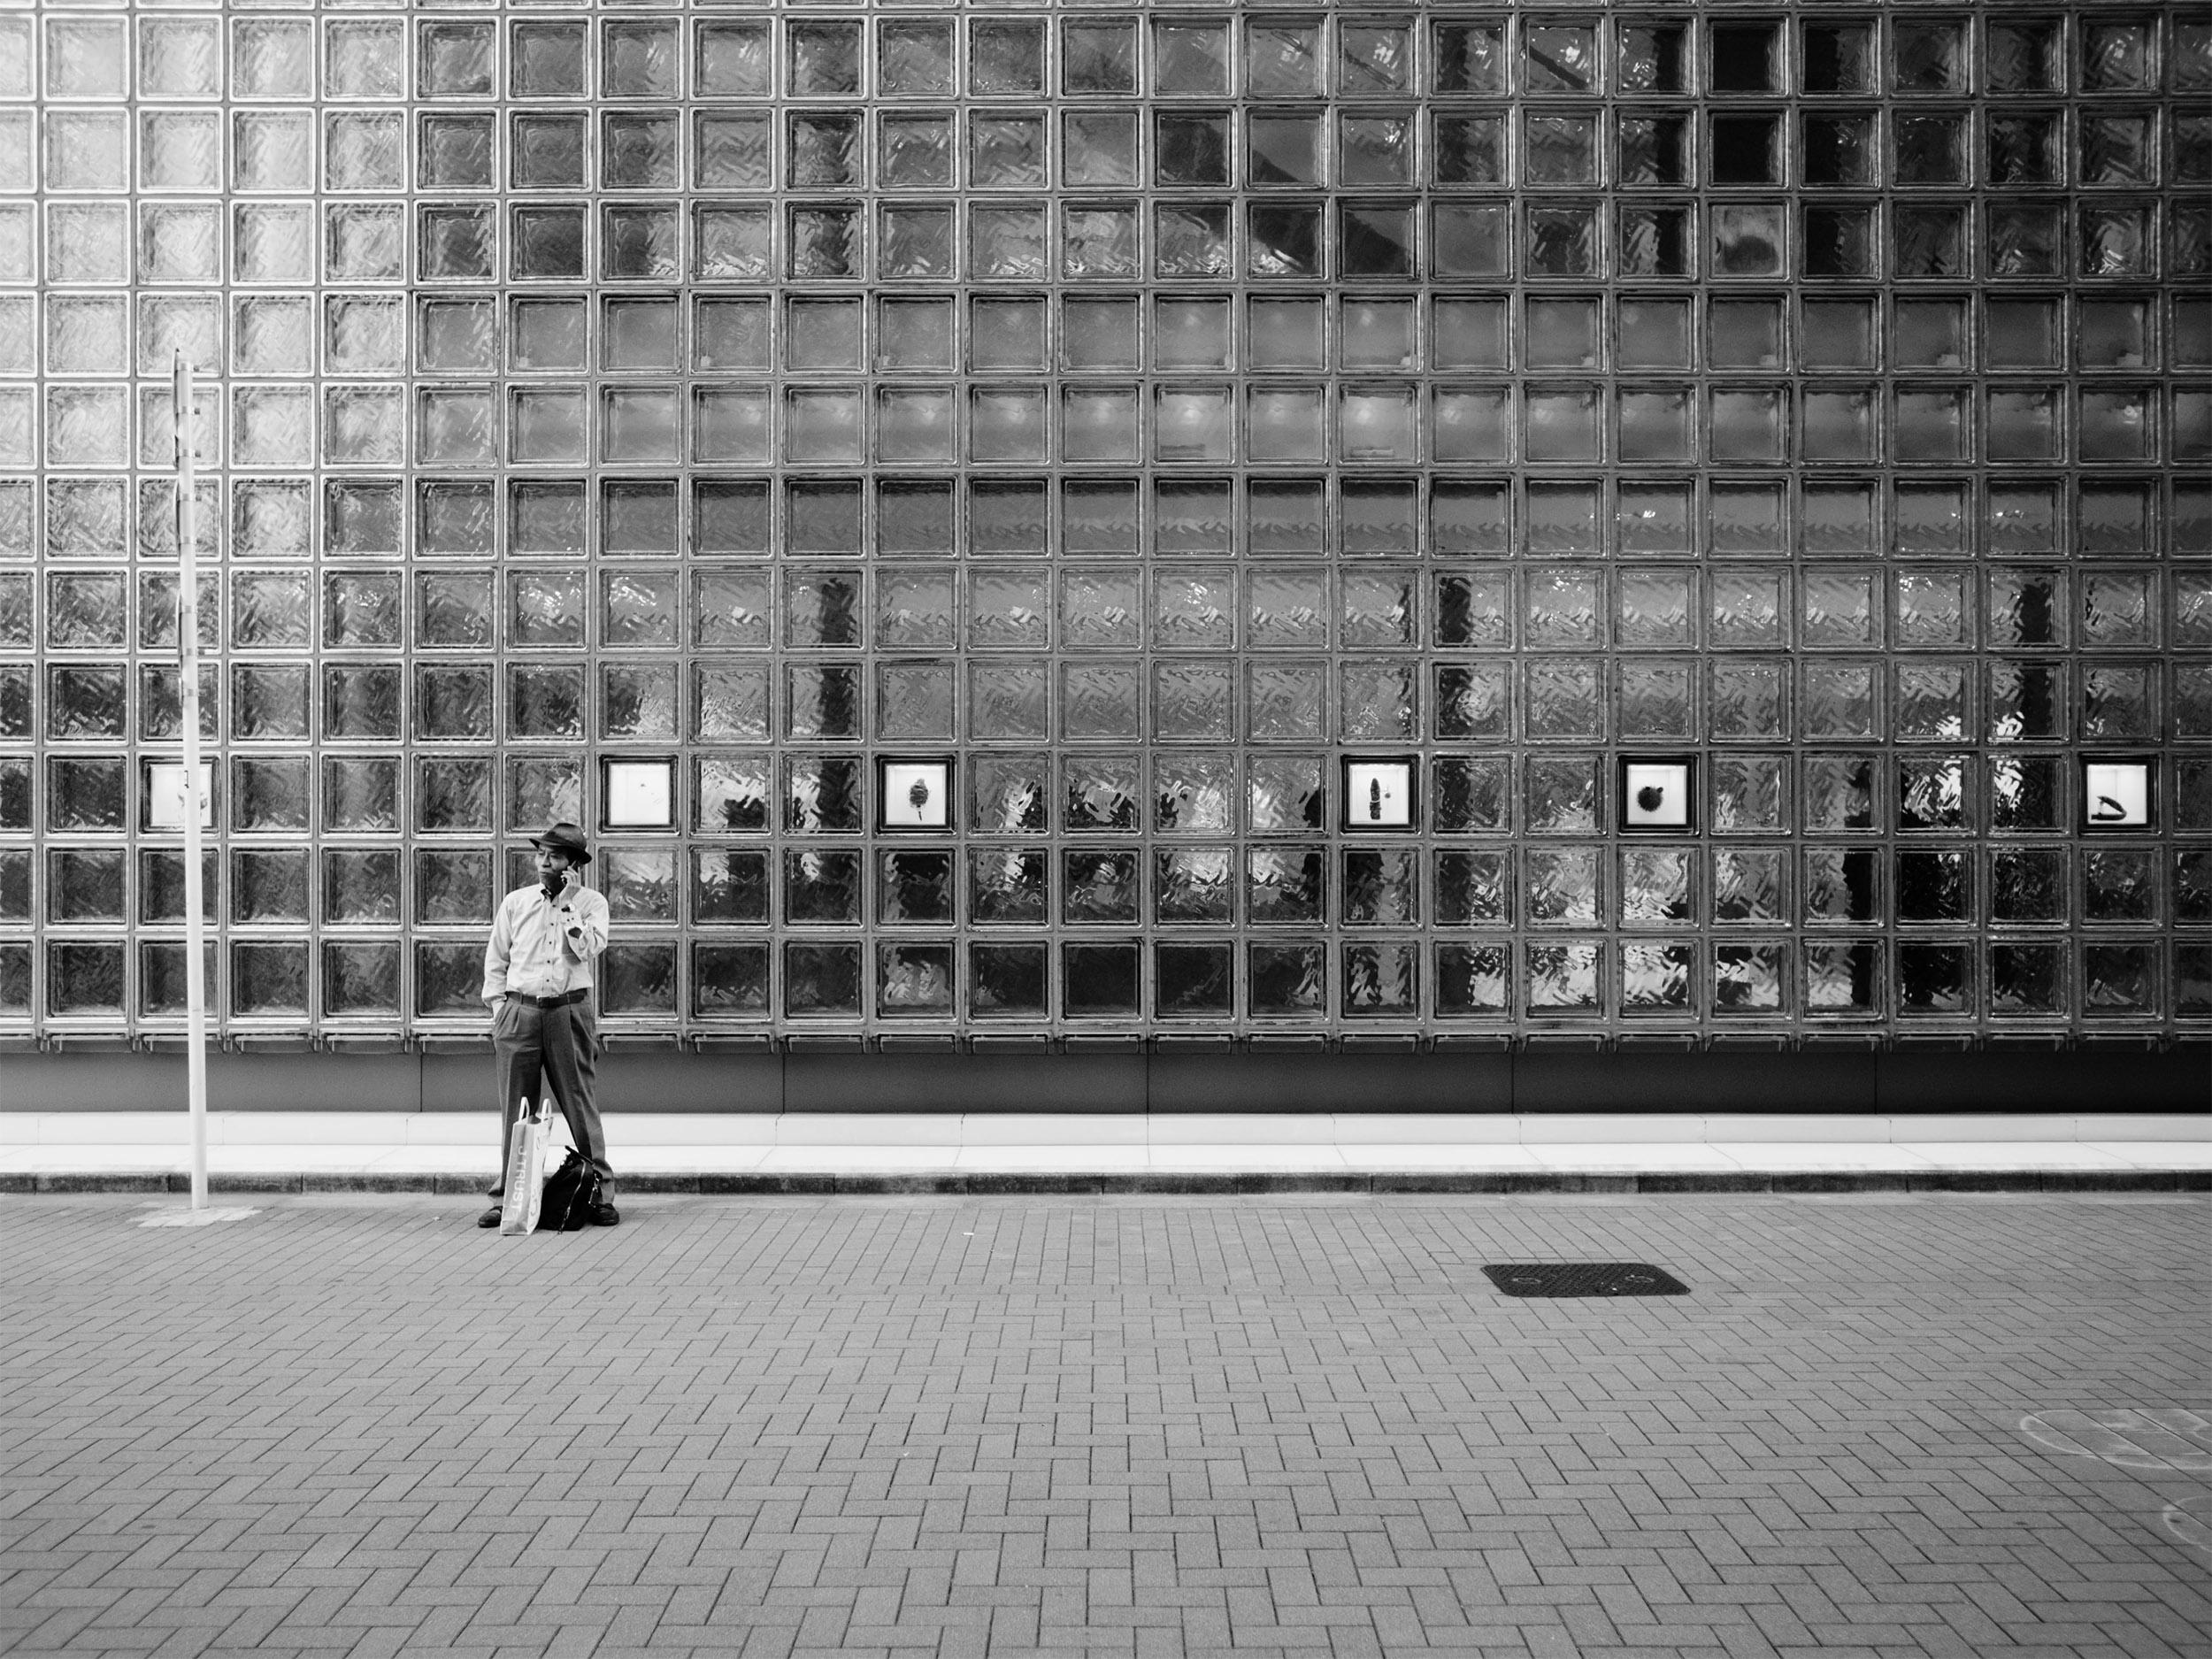 street-photography-tokyo-ginza_DSC8424.NEF.jpg